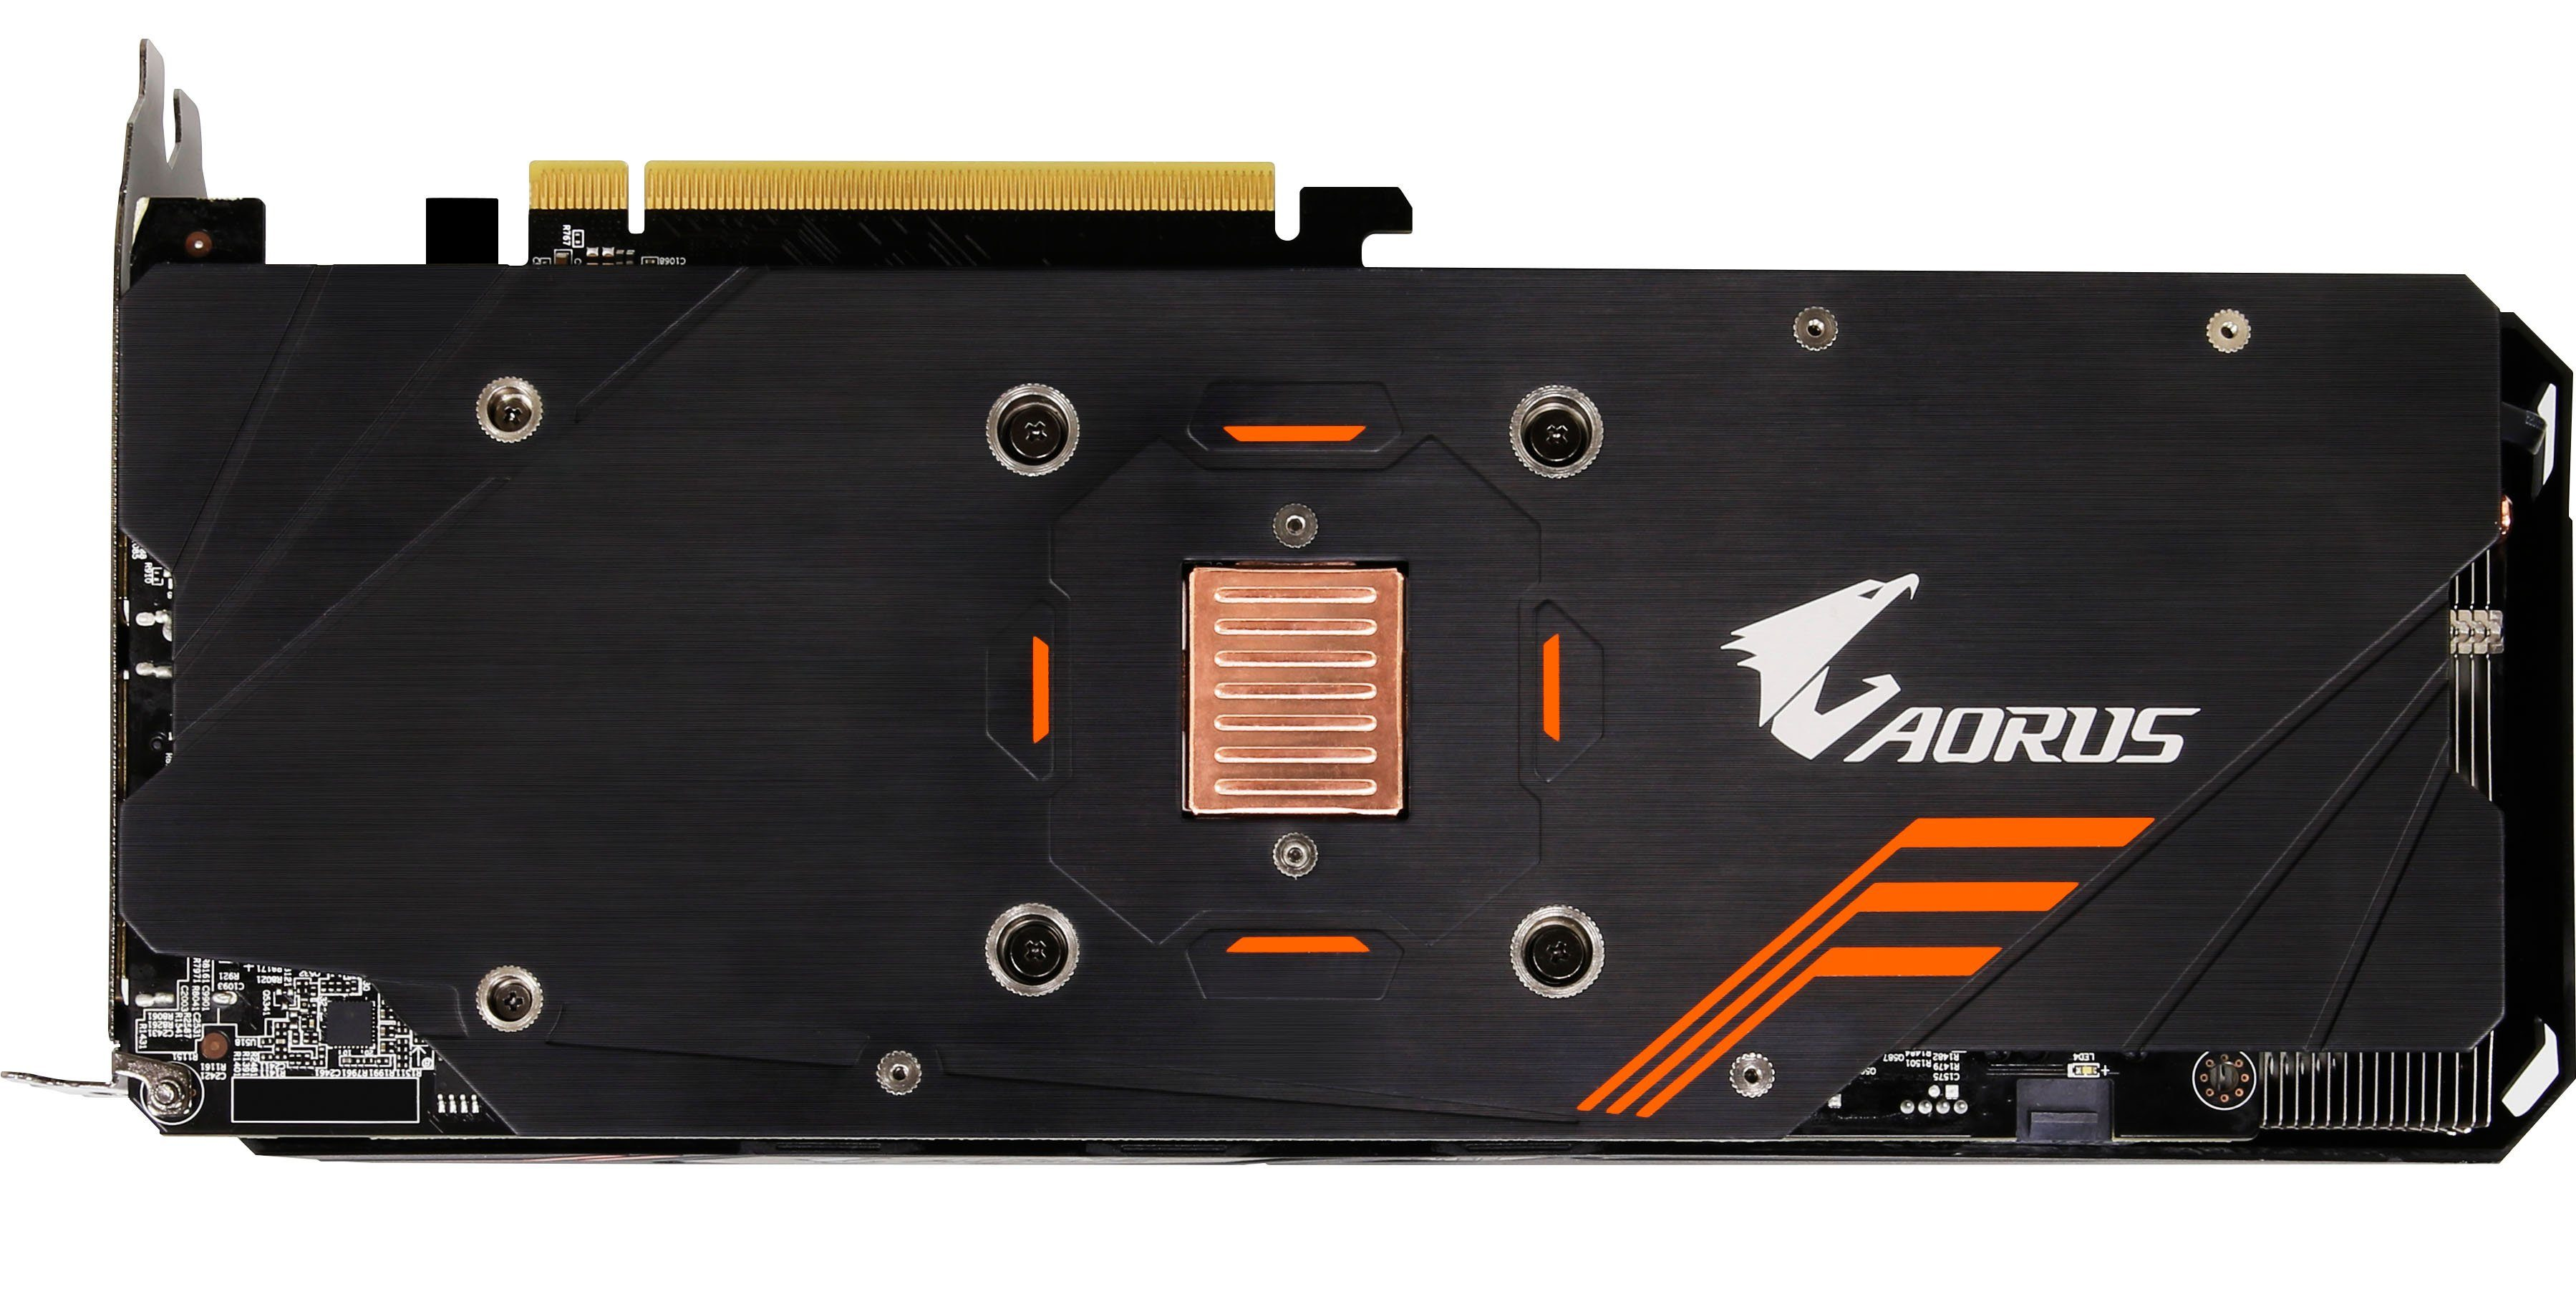 GIGABYTE Grafikkarte AORUS GeForce® GTX 1060 6GB 9Gbps »GV-N1060AORUS-6GD«